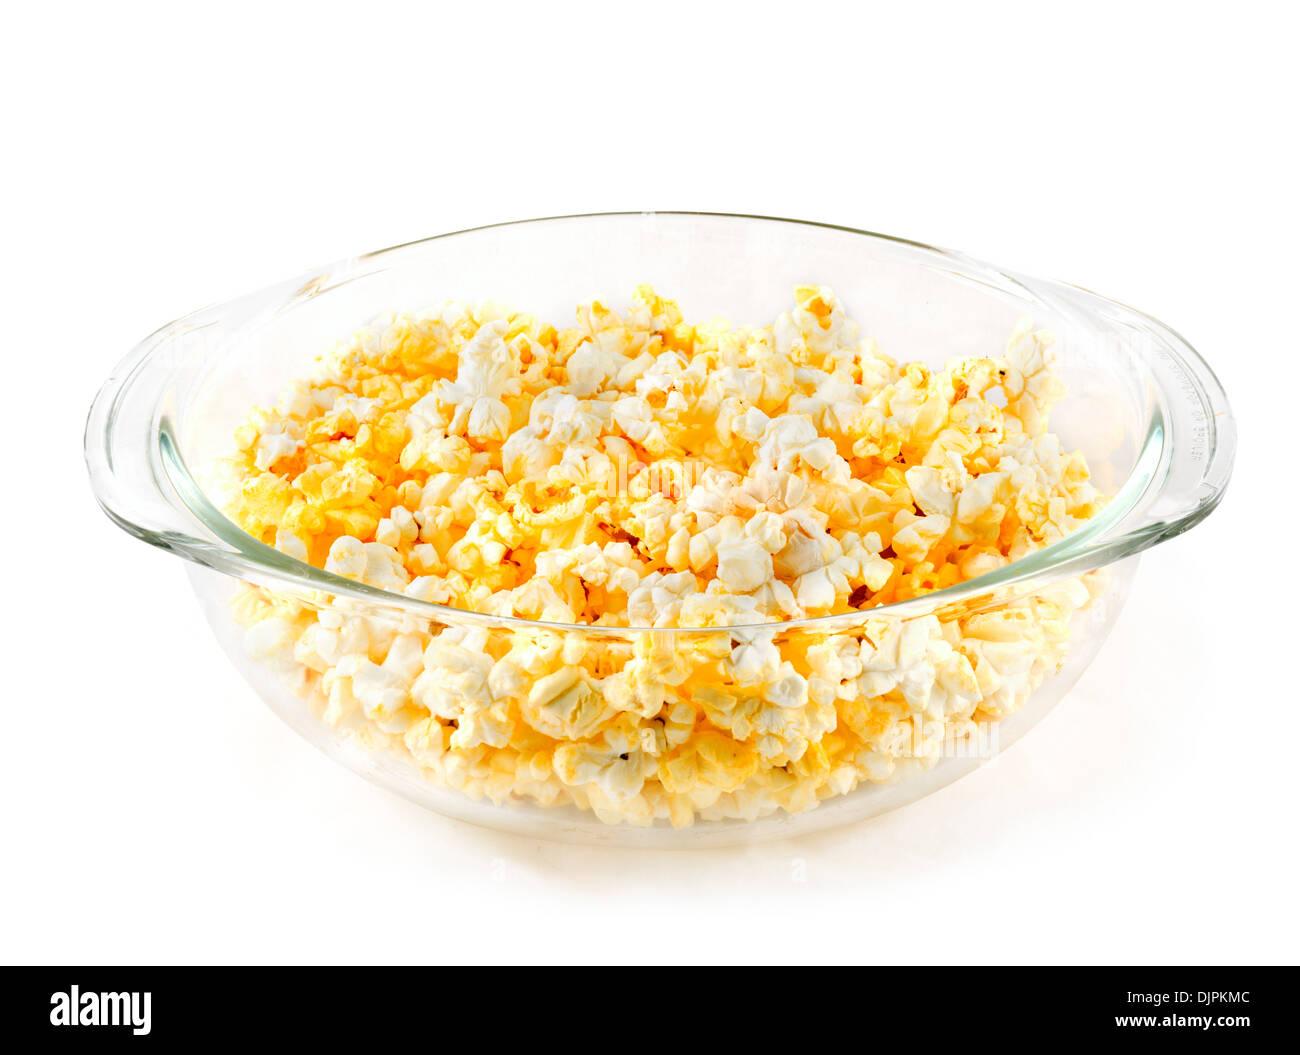 Bowl of Microwave Popcorn, USA - Stock Image